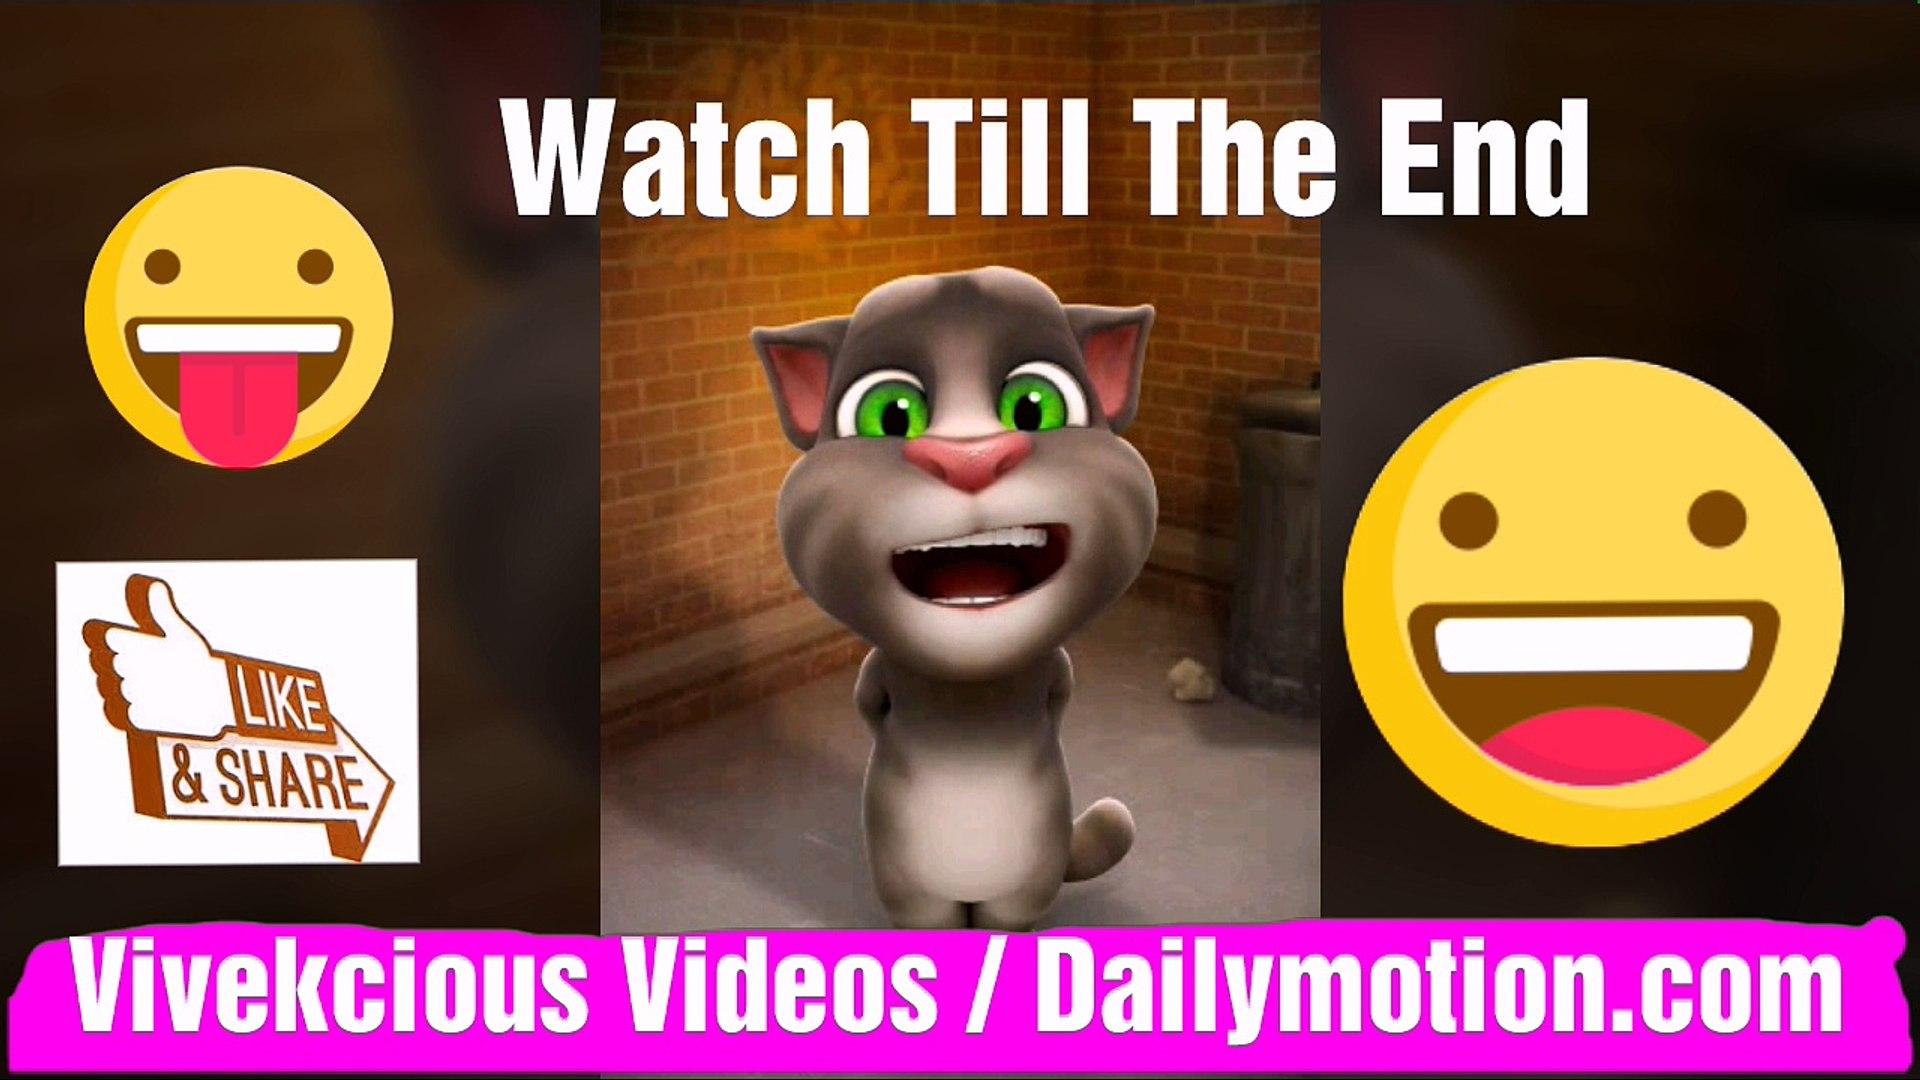 Maa - Beti Comedy Talking Tom Hindi Talking Tom Comedy Videos , Funny Talking Tom , Funny Tom Cat VI